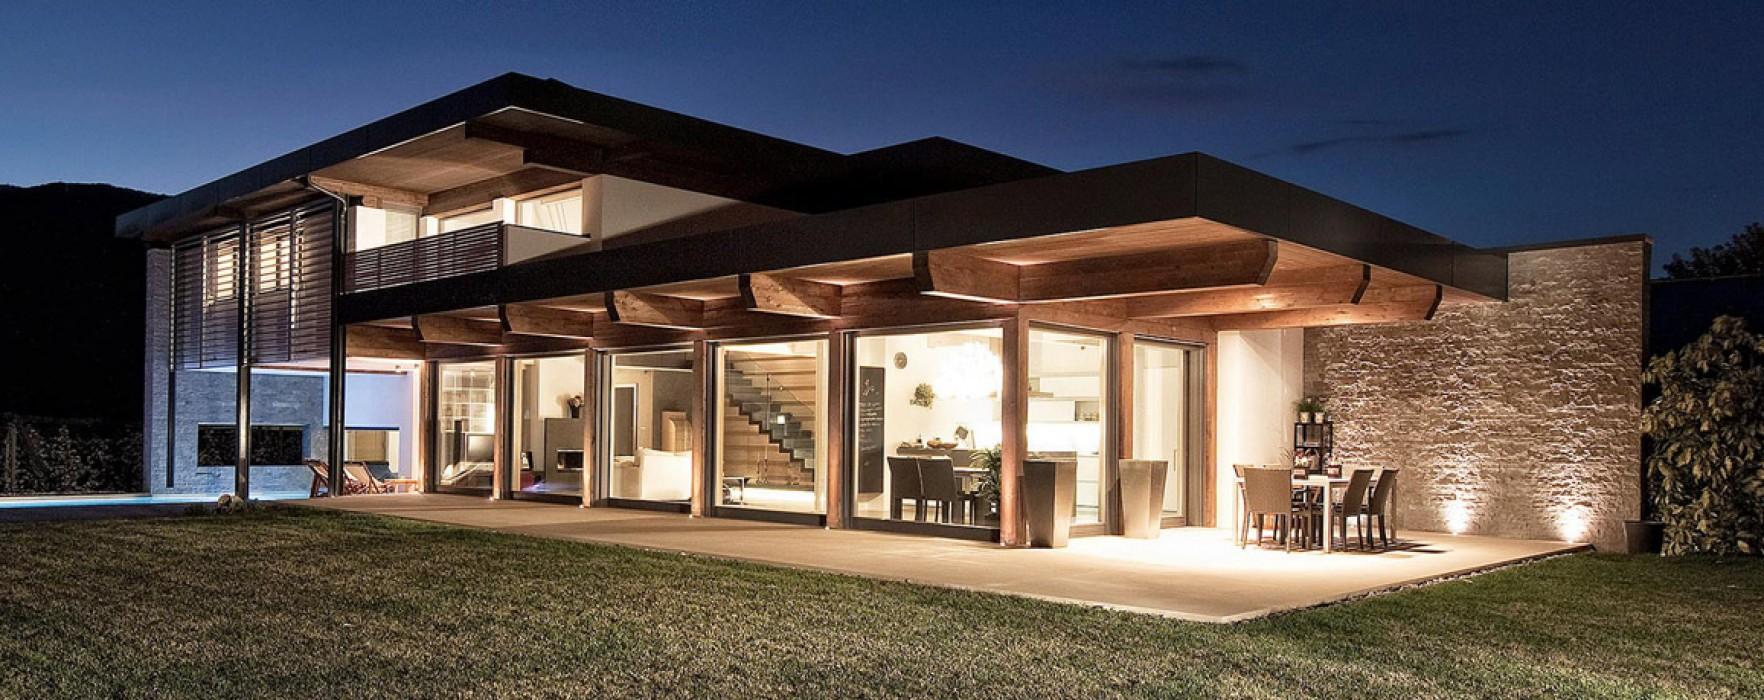 Case prefabbricate a struttura struttura mista for Costo case prefabbricate